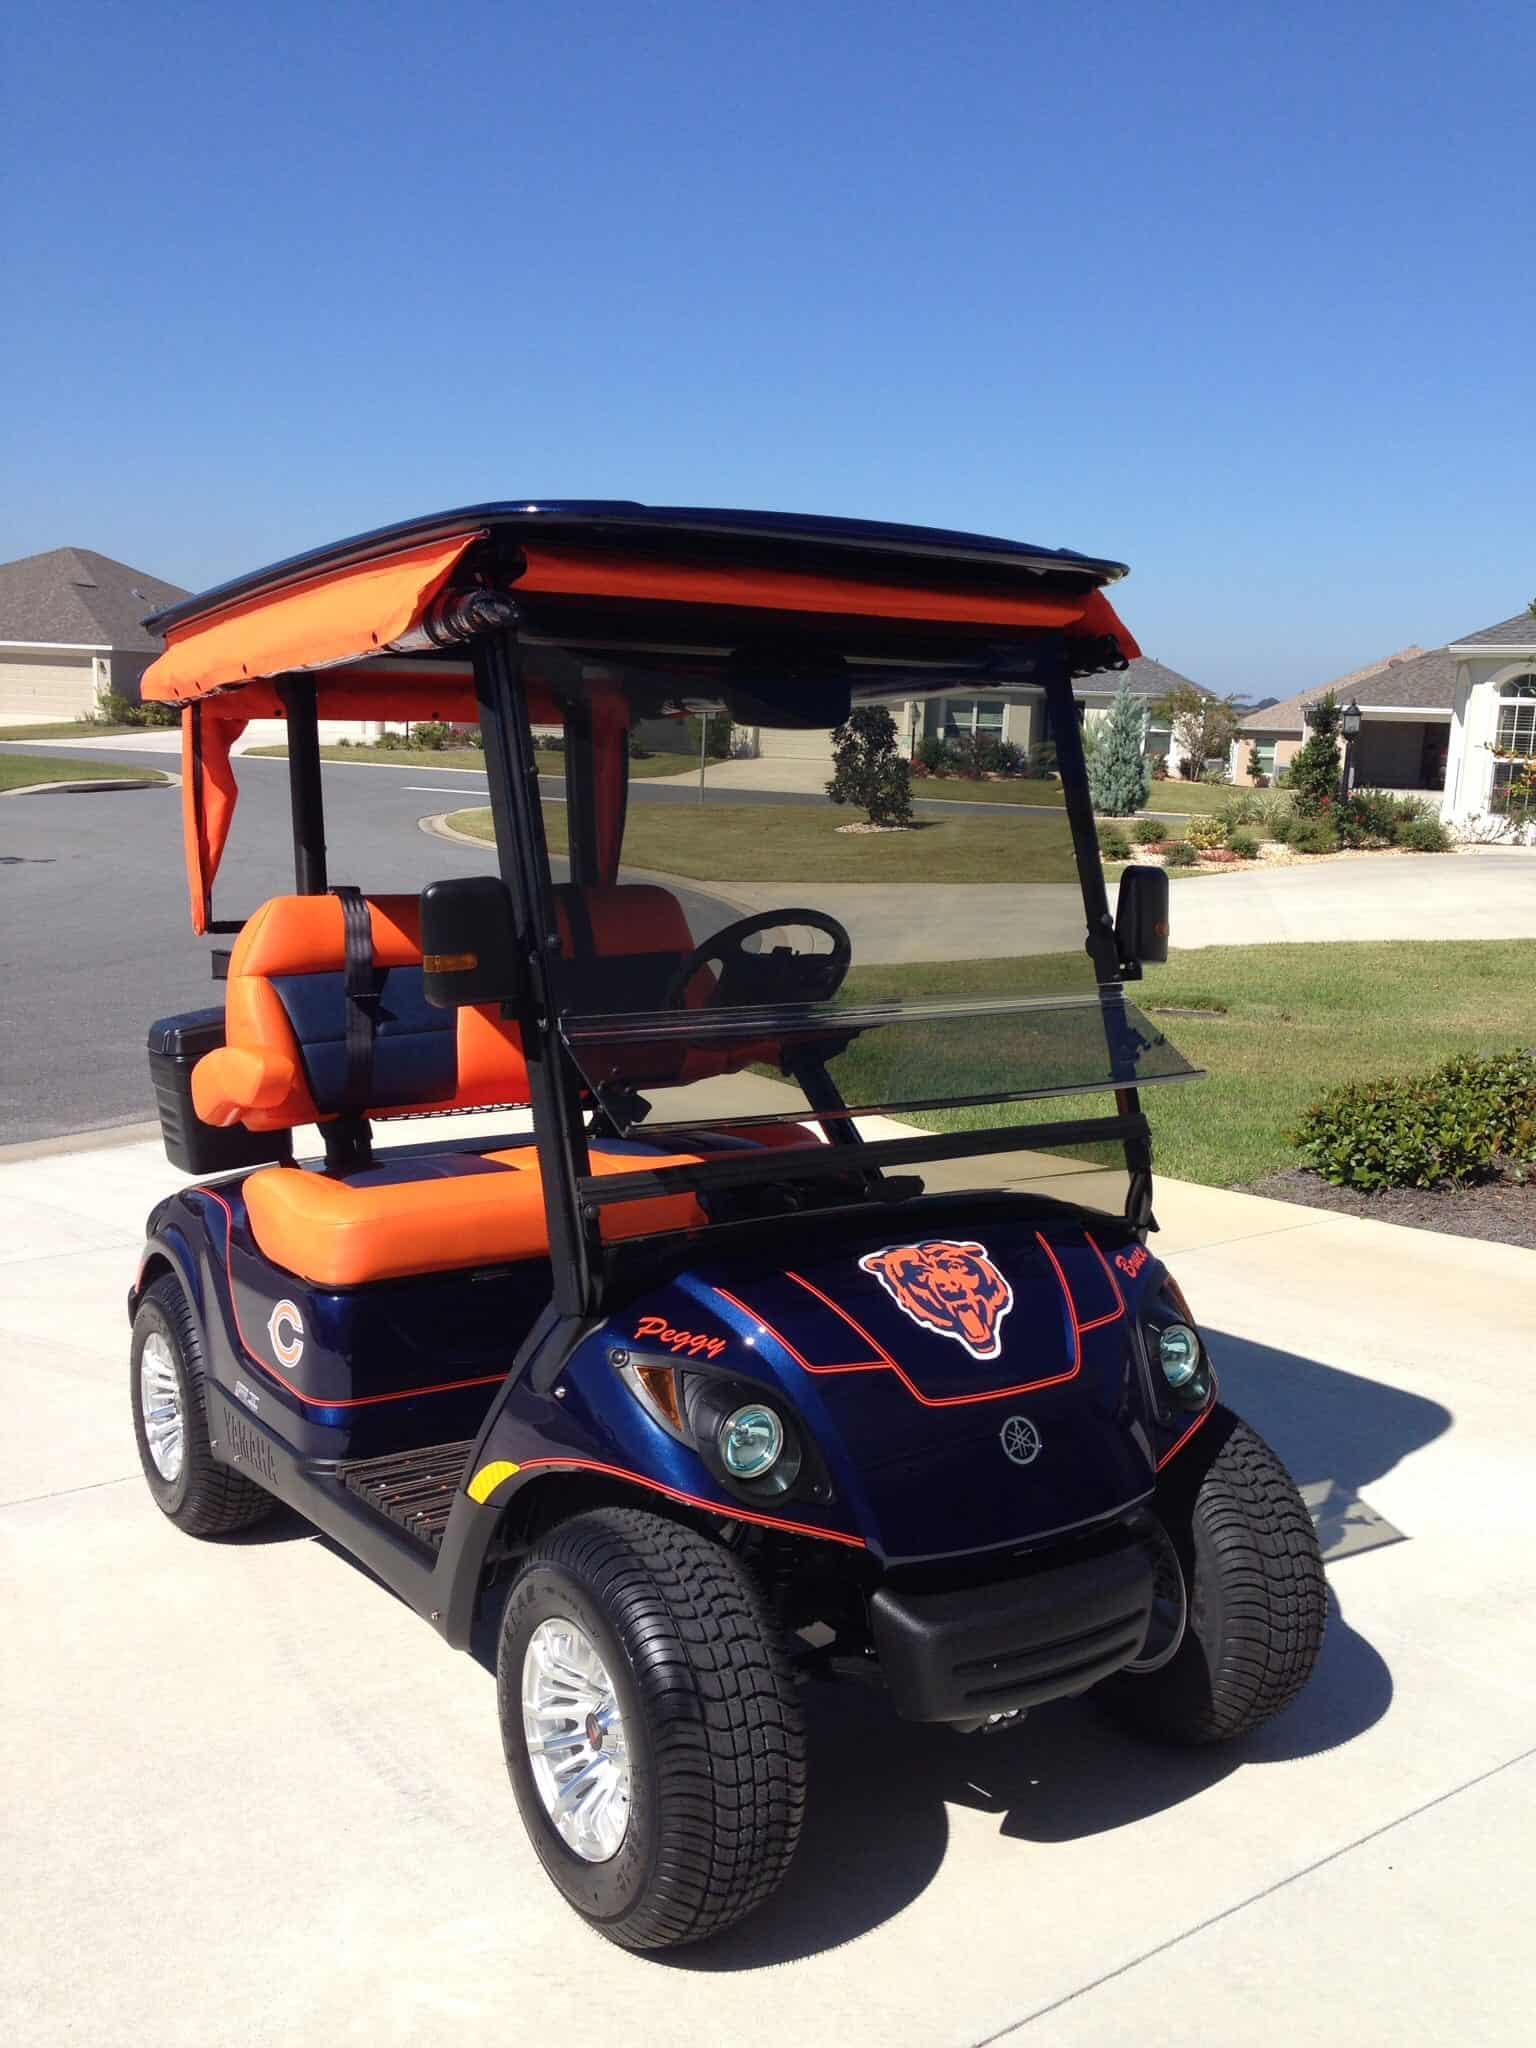 2015 chicago bears yamaha for Yamaha golf cart dealers in florida